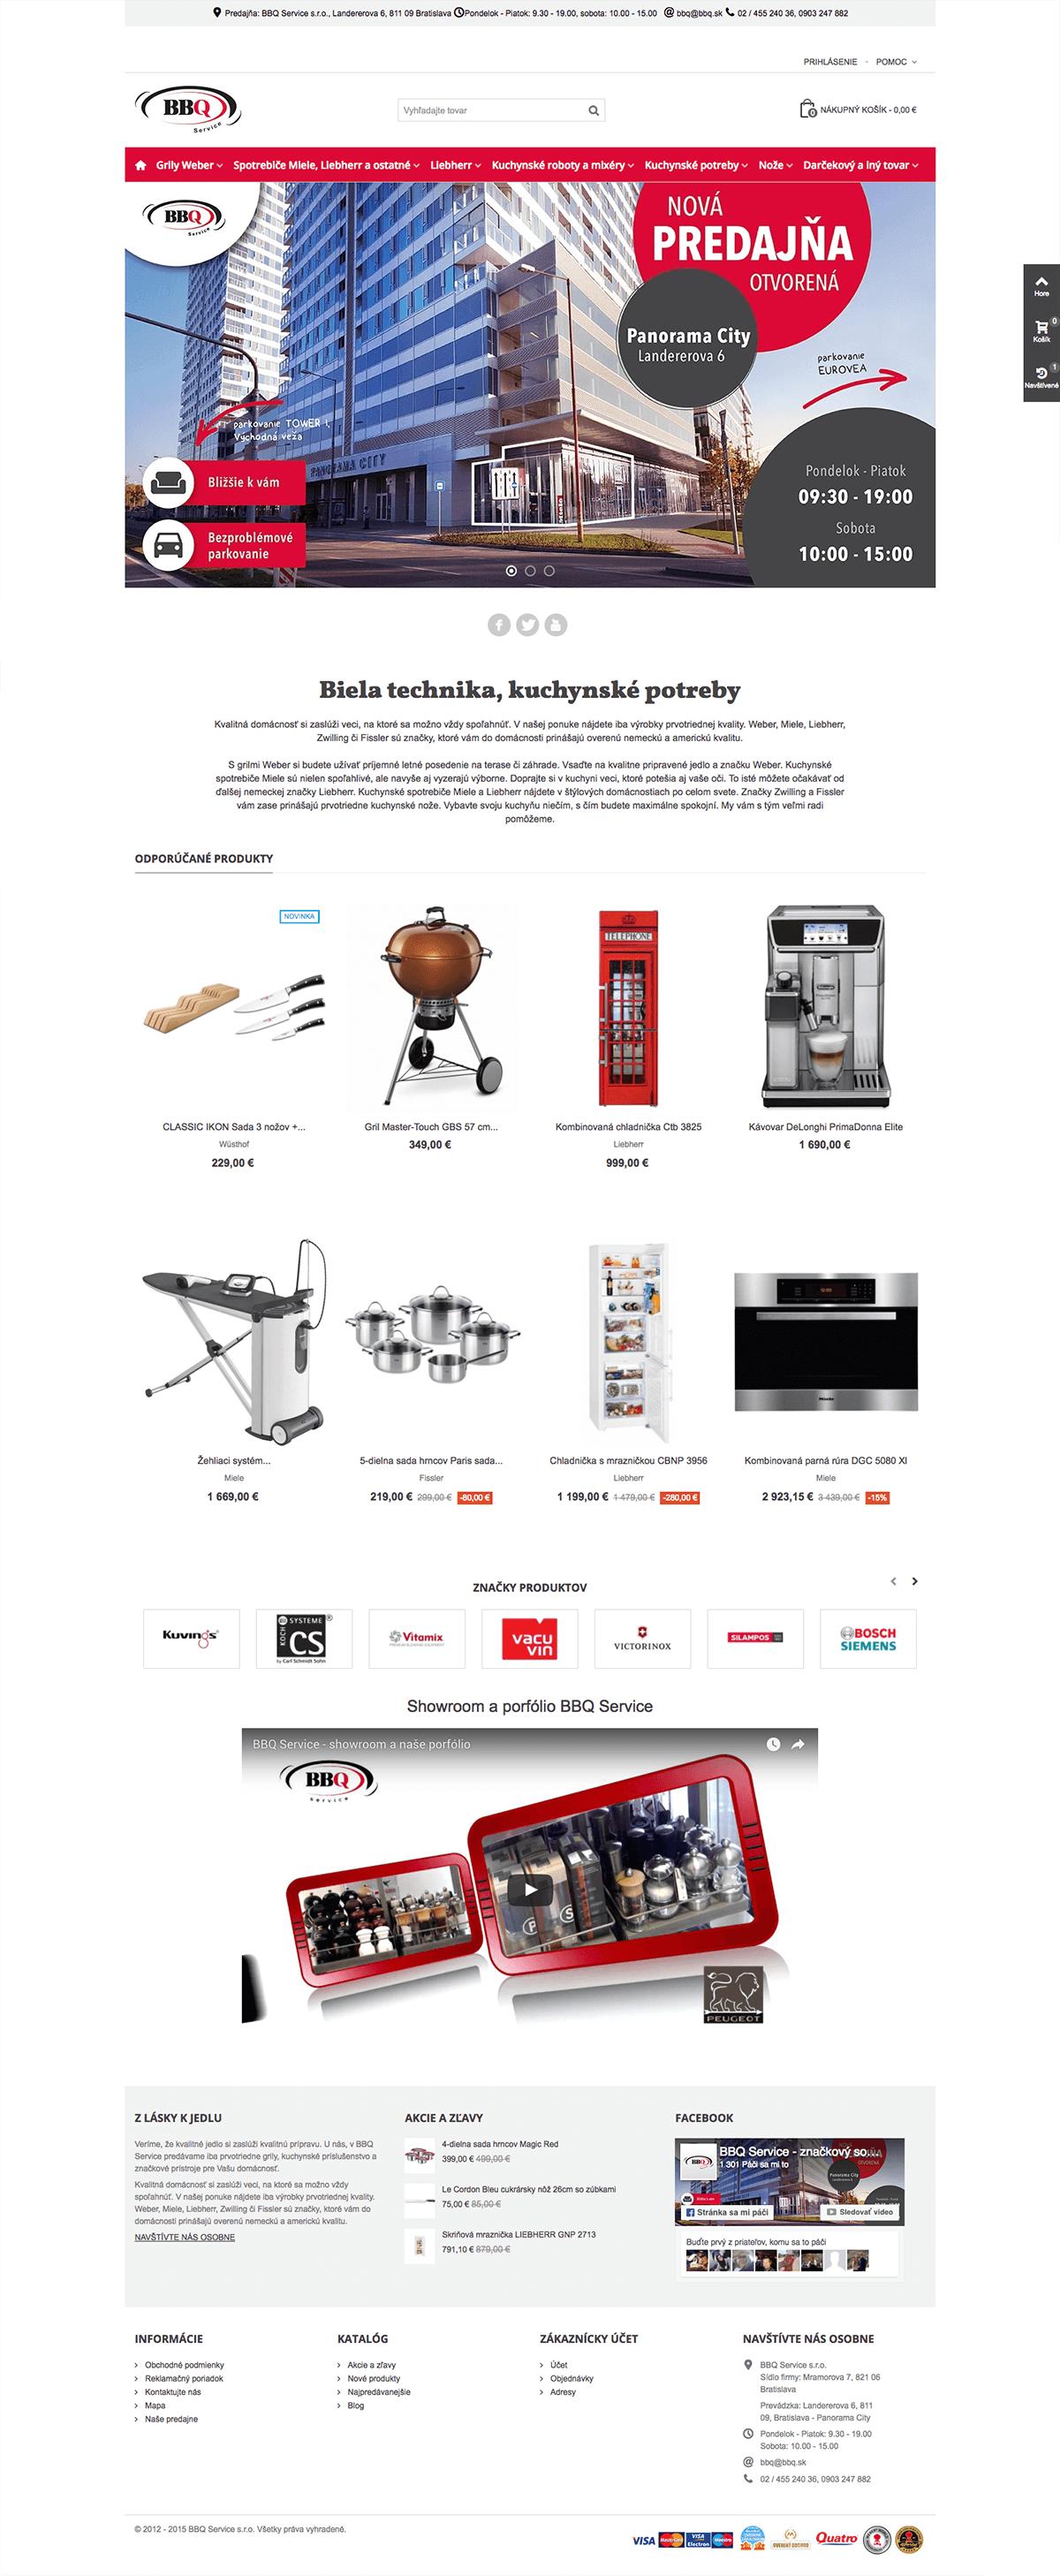 kuchynske-potreby-a-biela-technika-bbq-sk